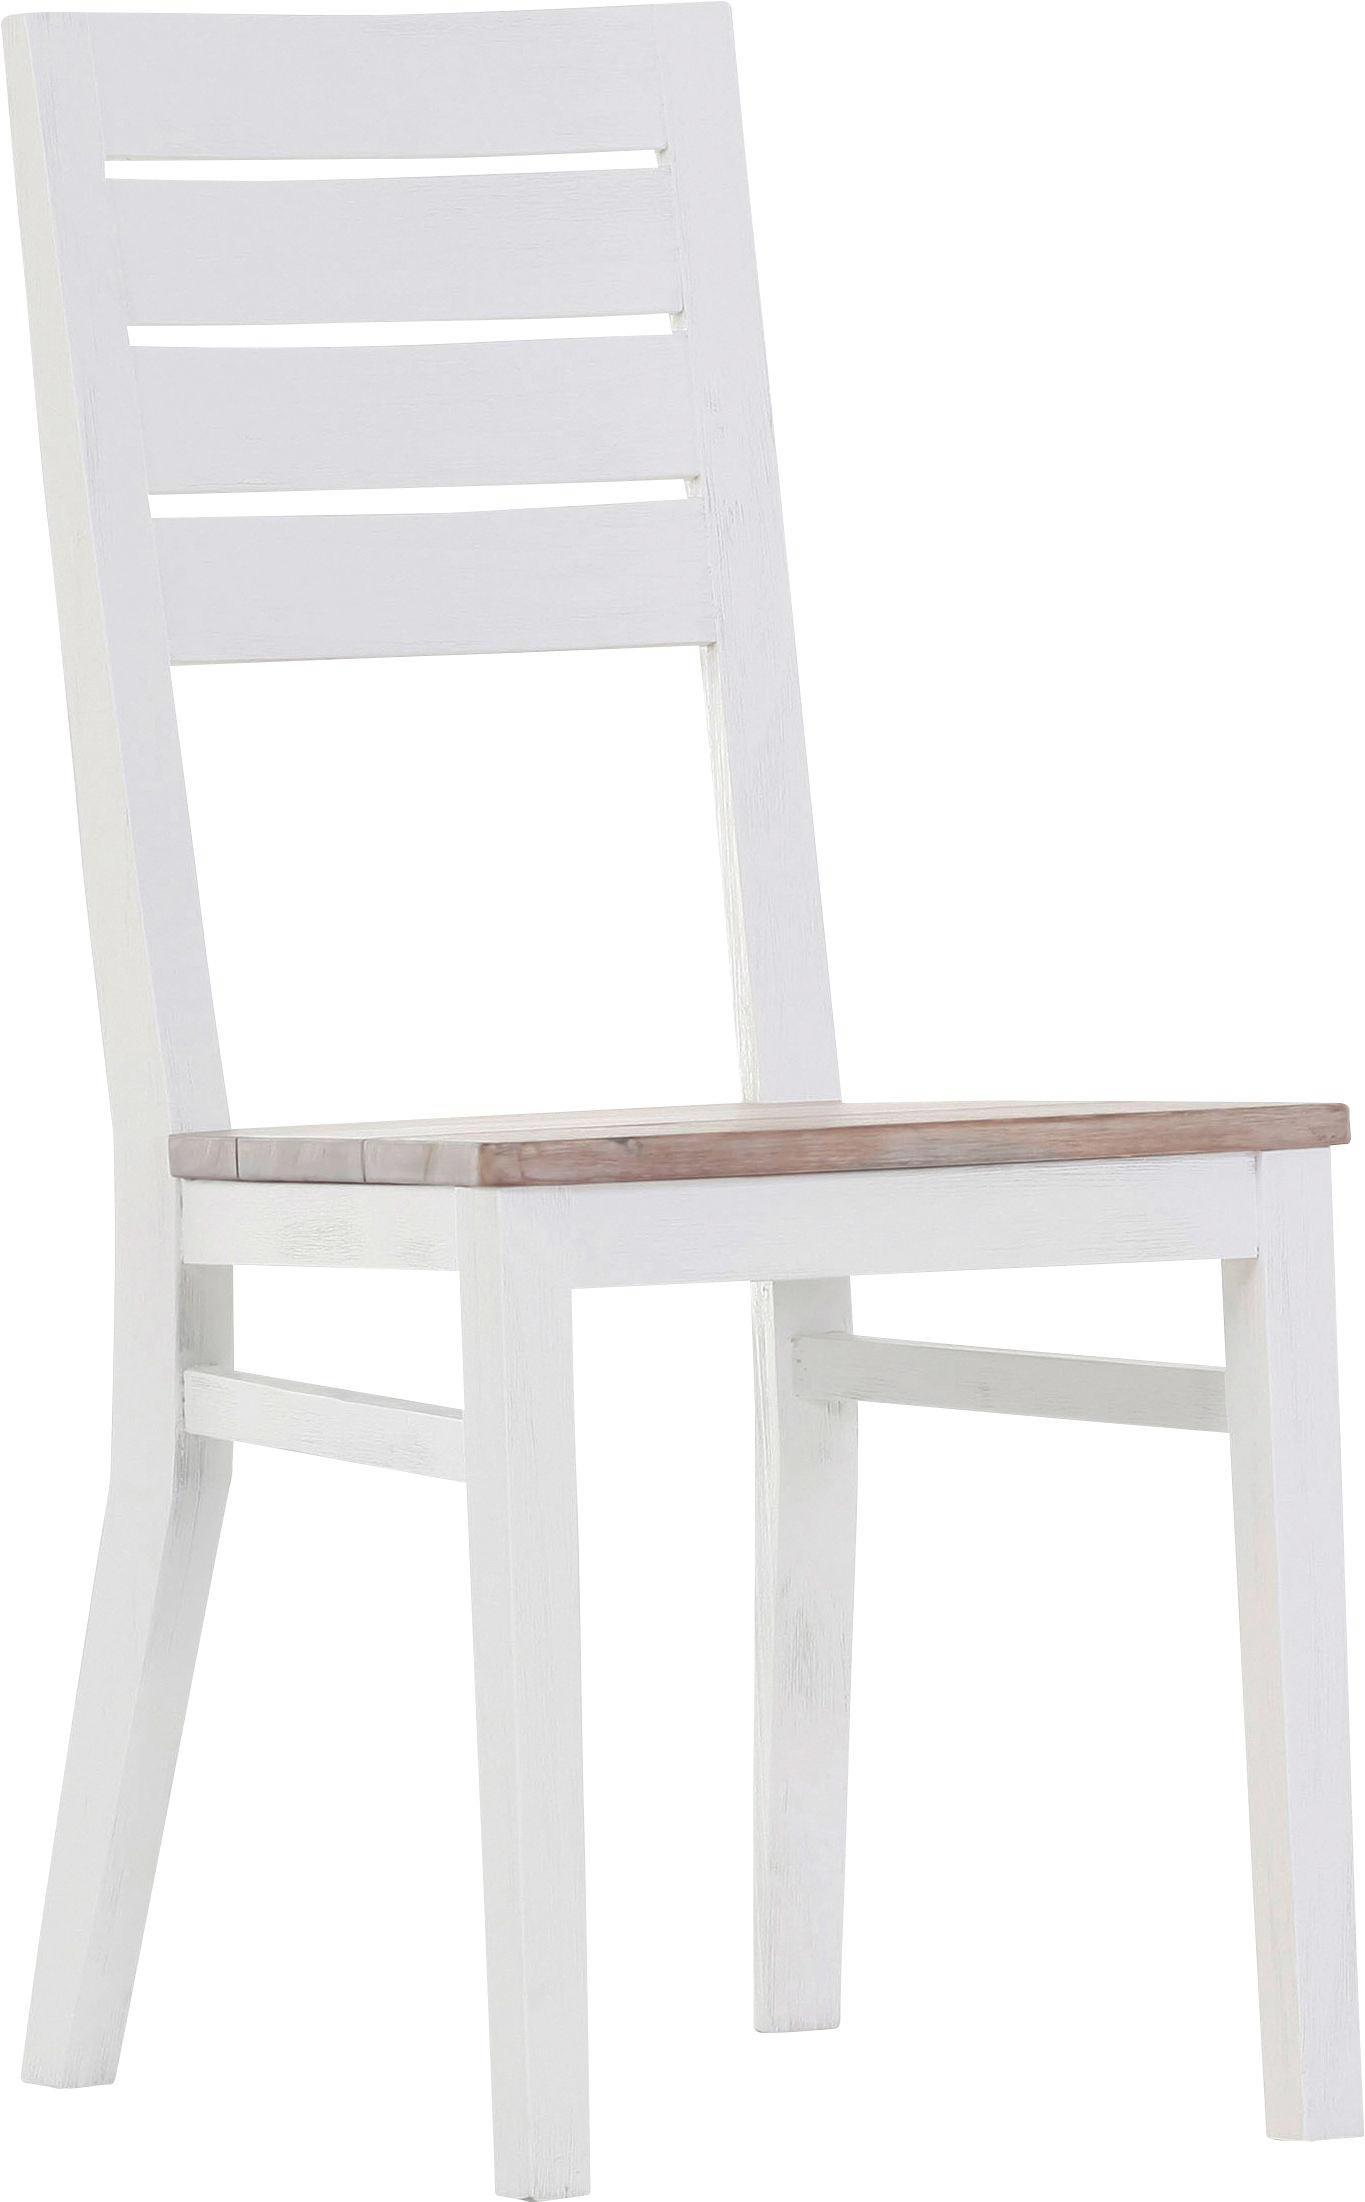 STUHL Akazie teilmassiv Akaziefarben, Weiß - Weiß/Akaziefarben, Basics, Holz (54/97/47cm) - CARRYHOME